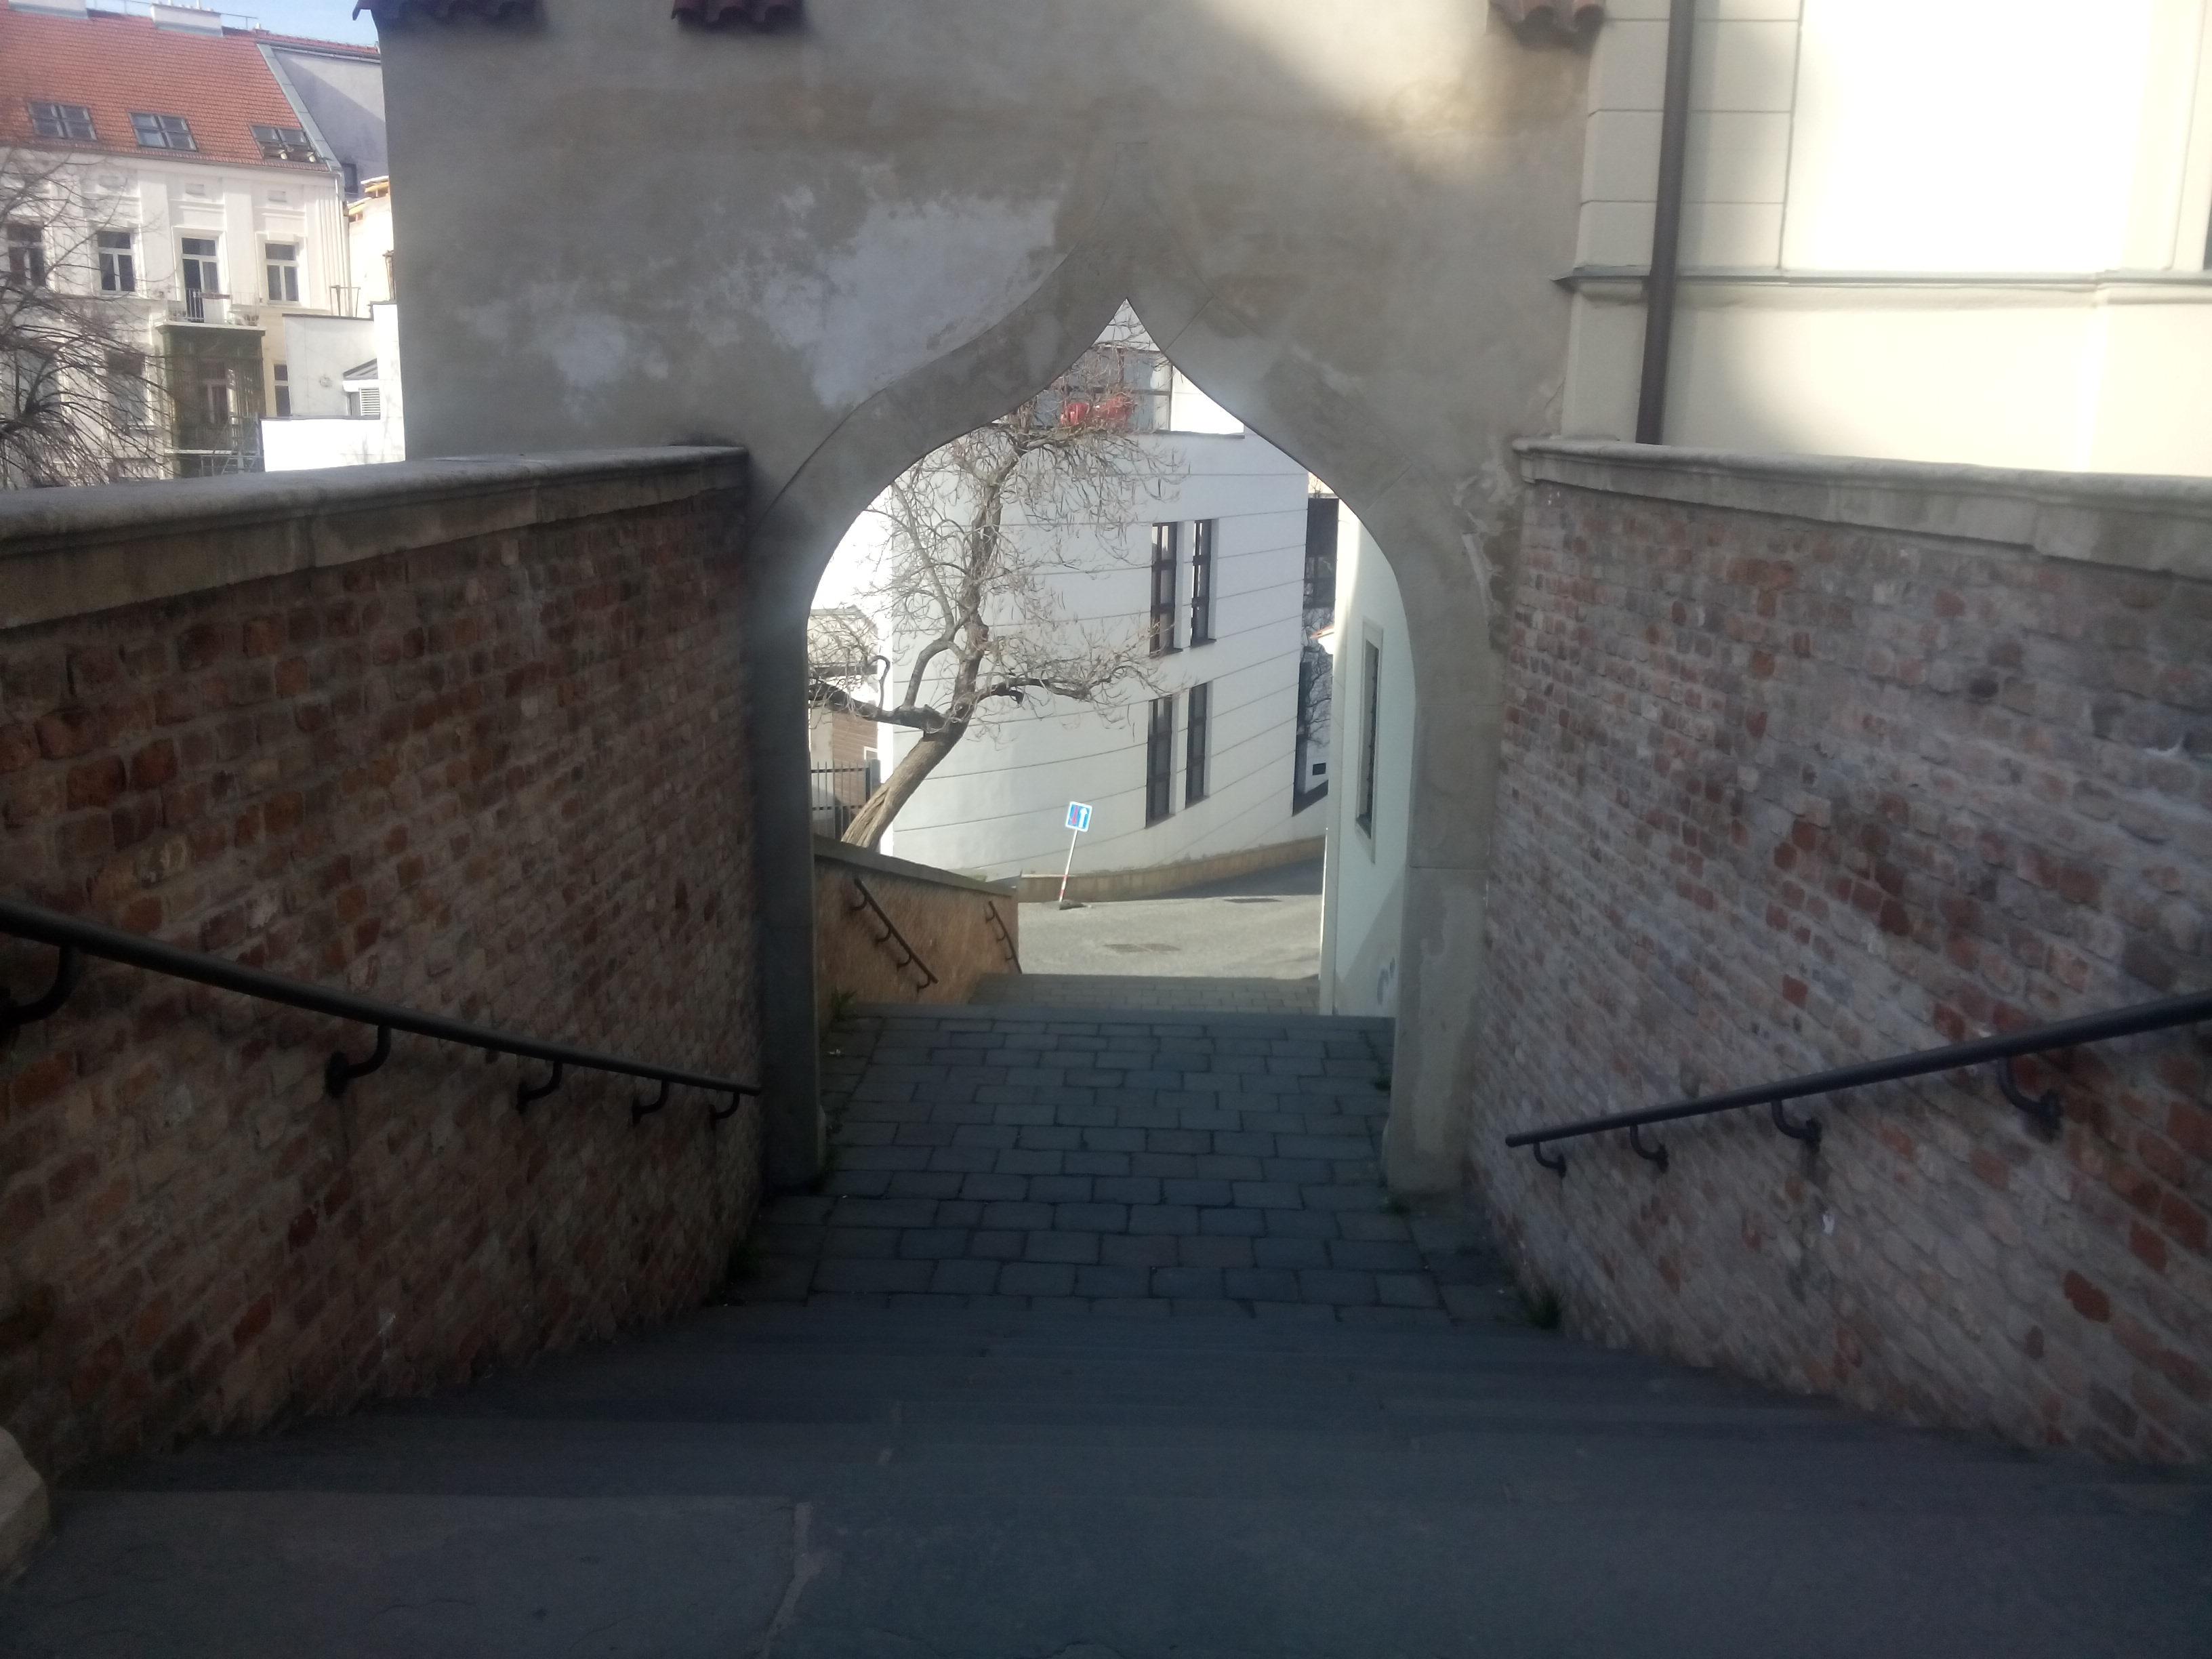 https://i.amy.gy/201804-slovakia-austria-czech/IMG_20180414_170248.jpg